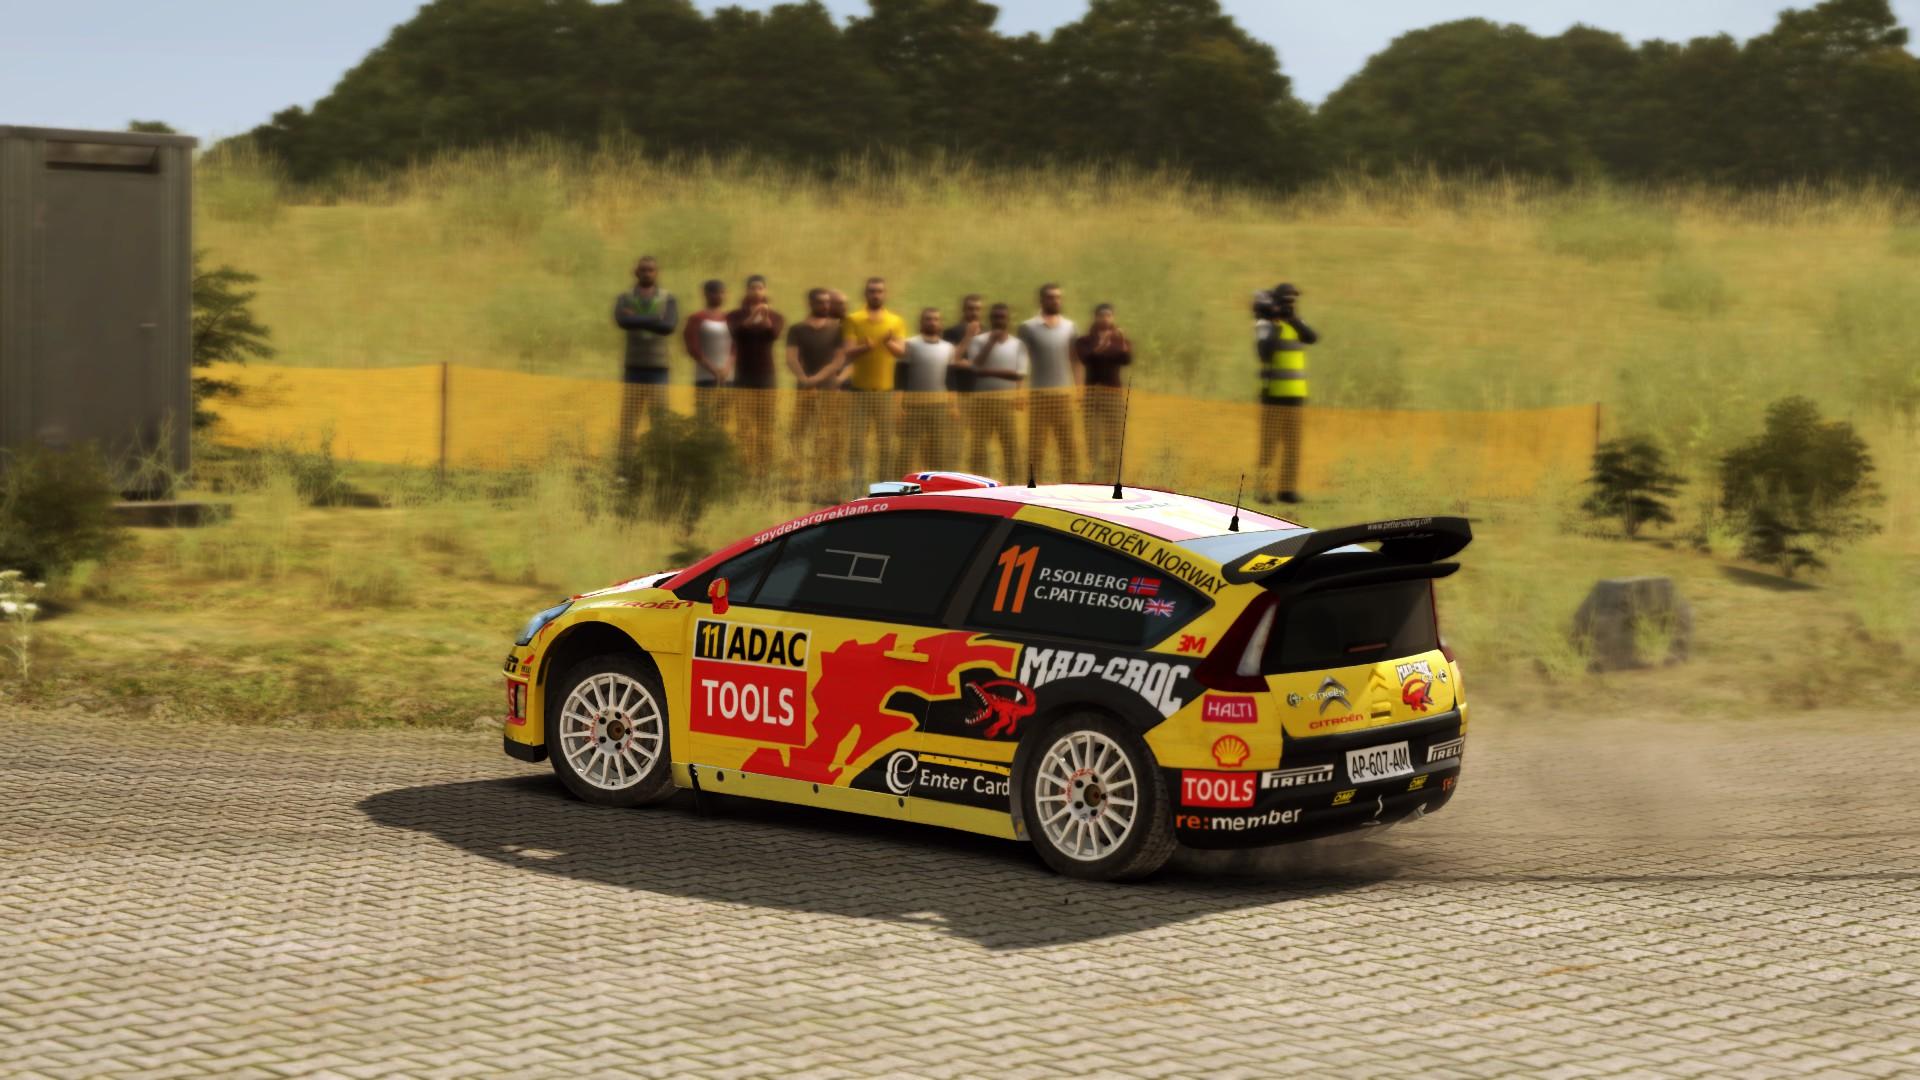 Http www racedepartment com downloads s loeb citroën c4 wrc 2007 livery mod 7815 2010s skins